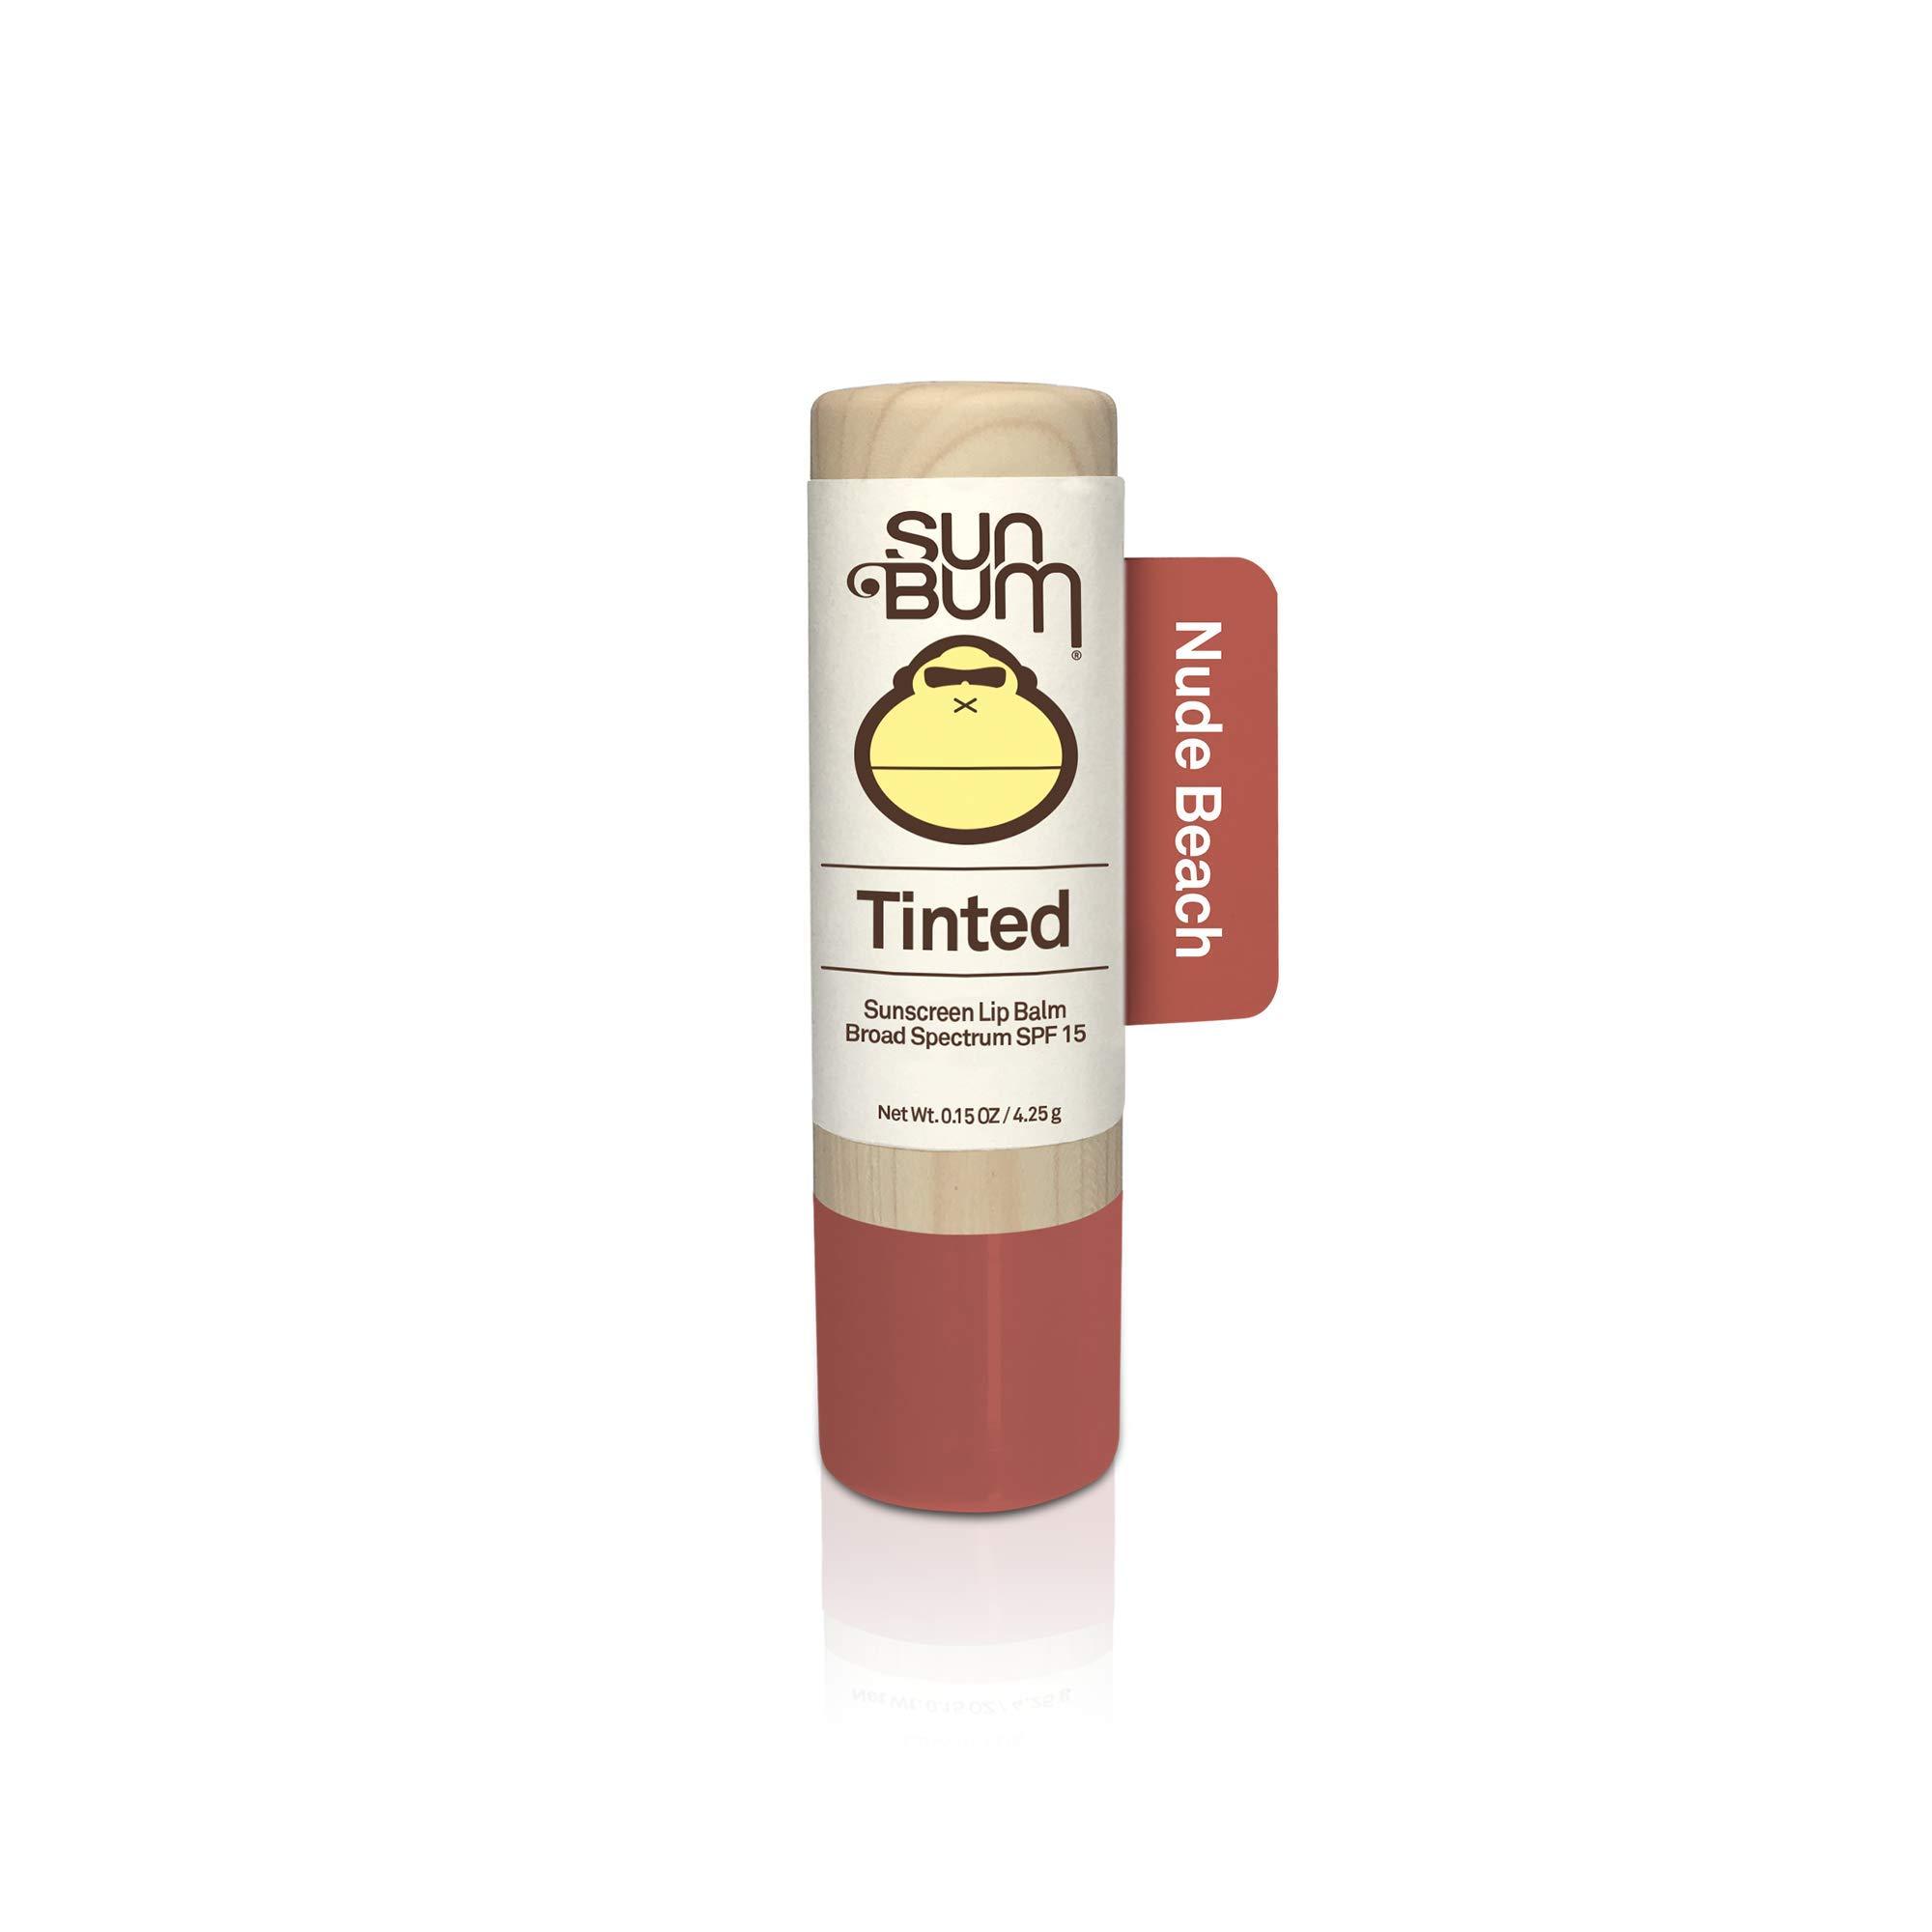 Sun Bum Tinted Lip Balm Nude Beach | SPF 15 | UVA / UVB Broad Spectrum Protection | Sensitive Skin Safe | Hypoallergenic, Paraben Free | Ozybenzone Free | 0.15 Oz